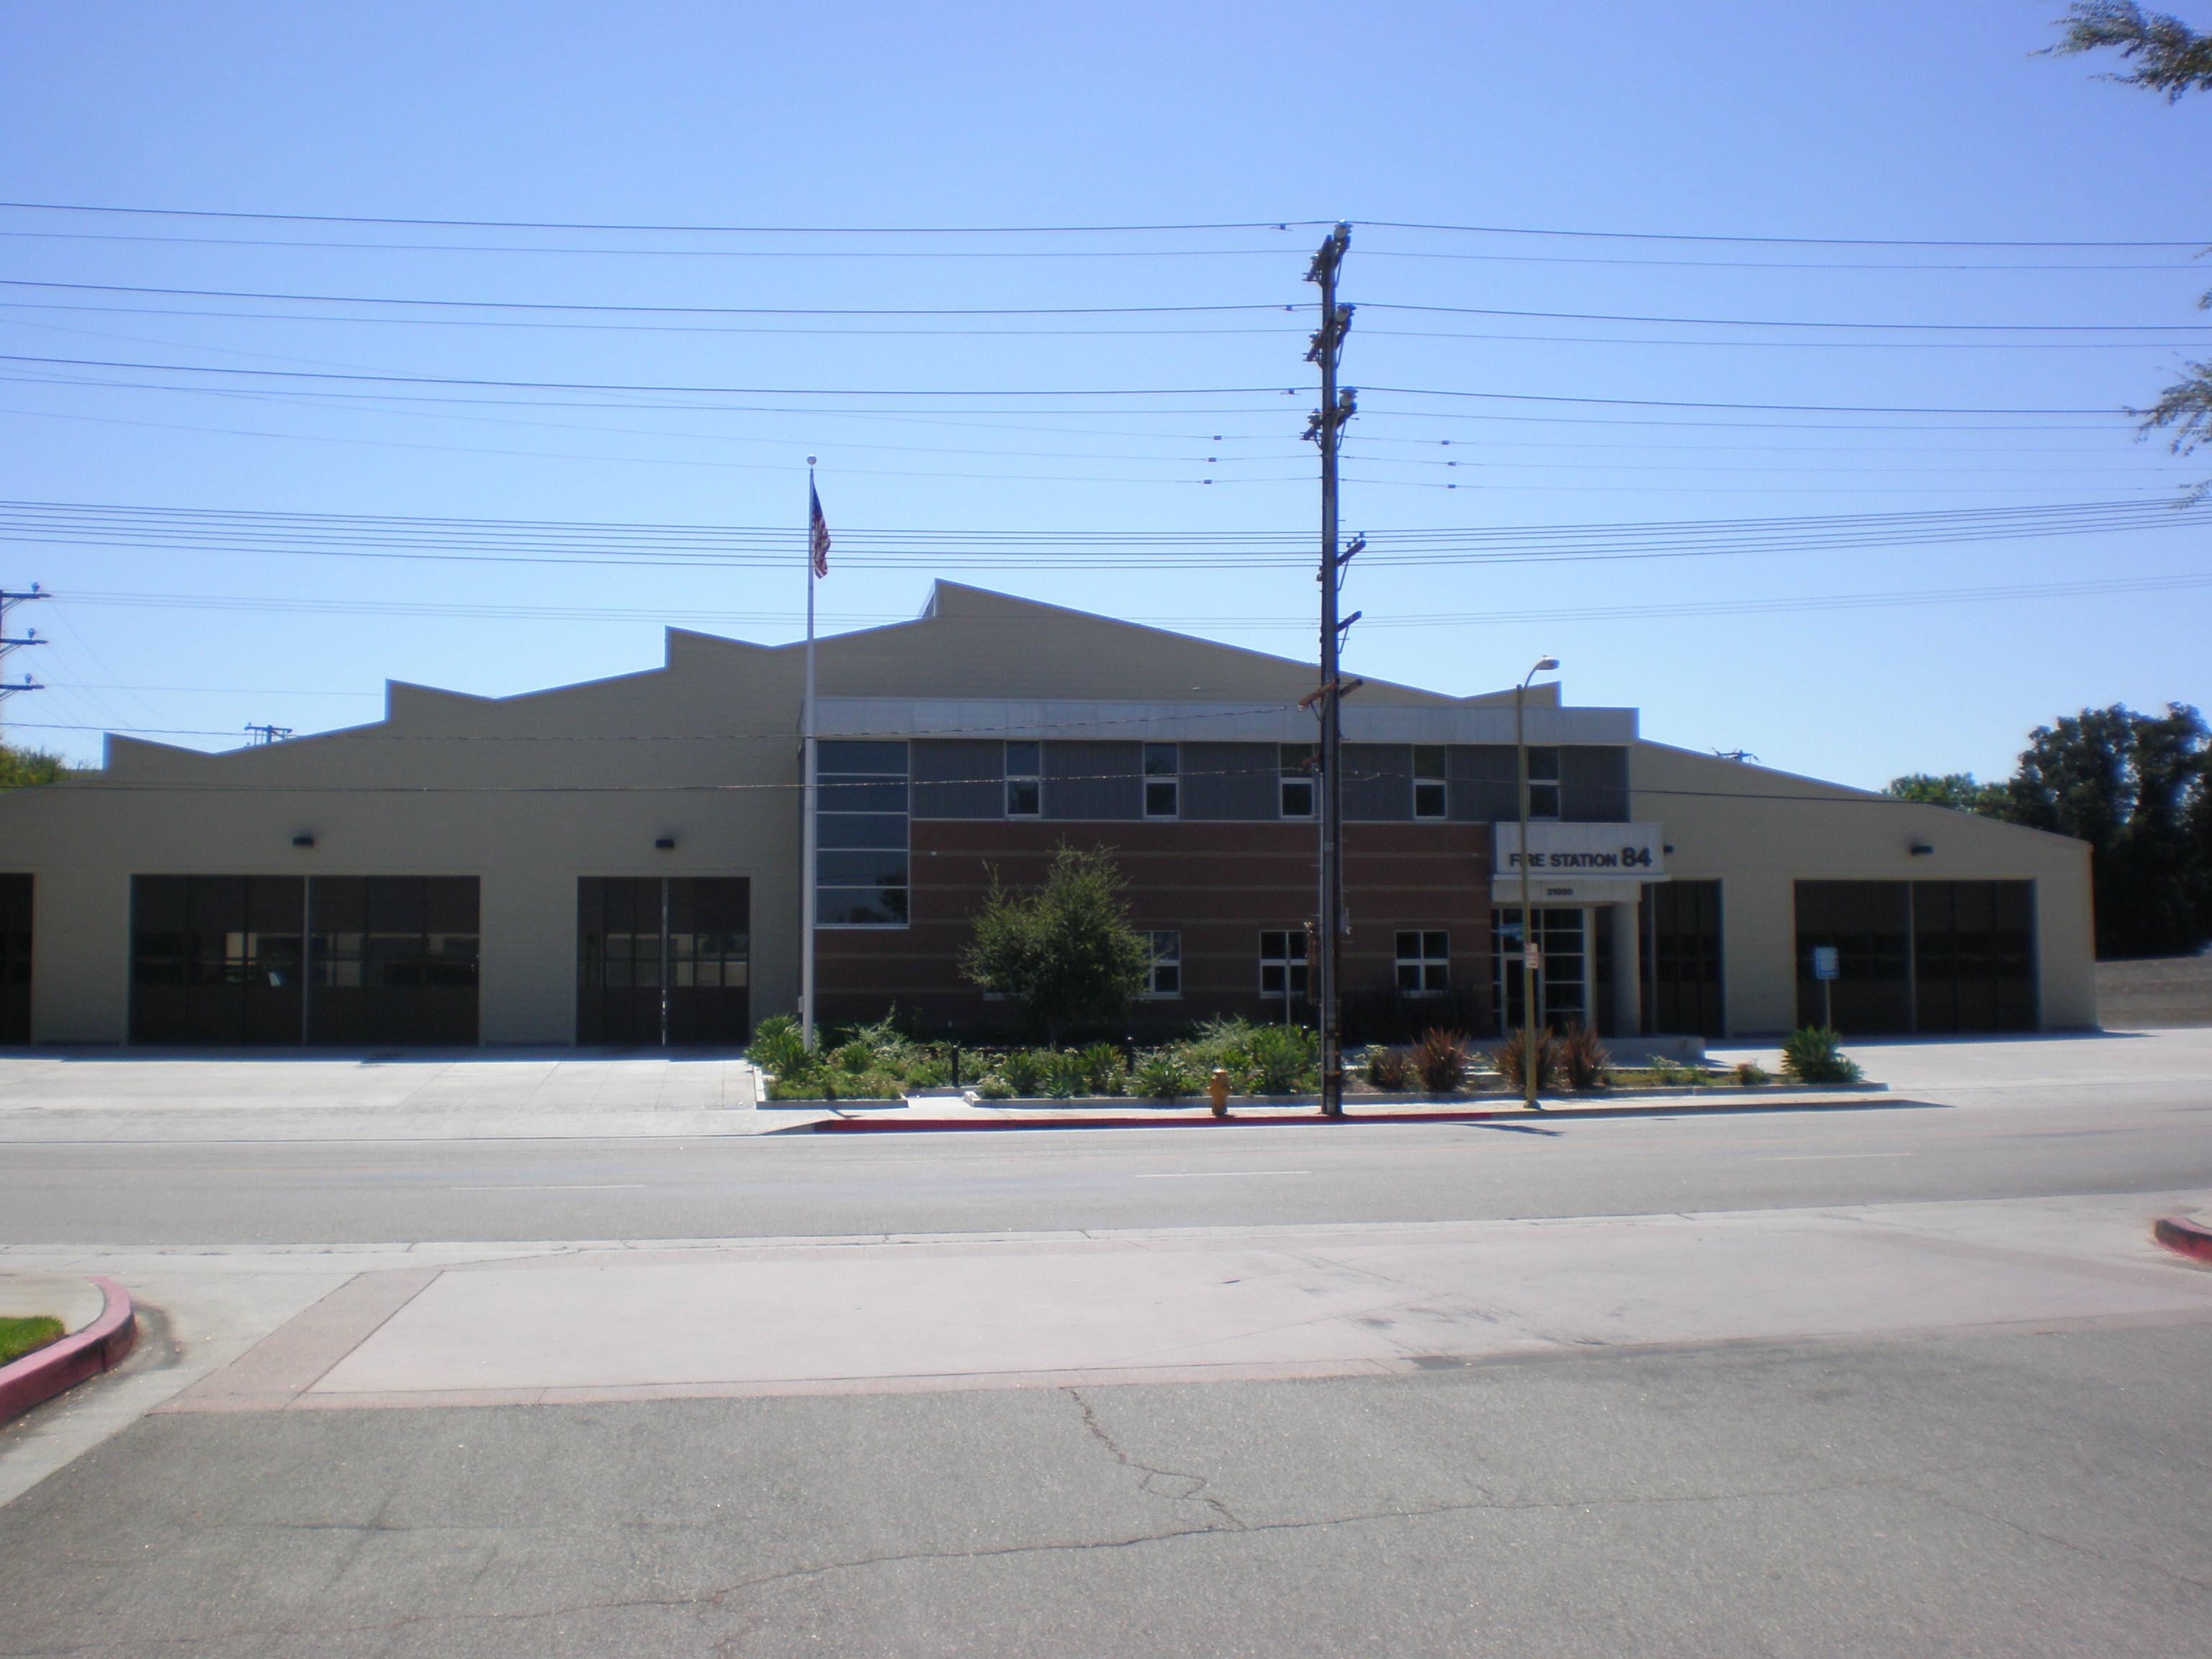 File:LAFD Station - 84 JPG - Wikimedia Commons